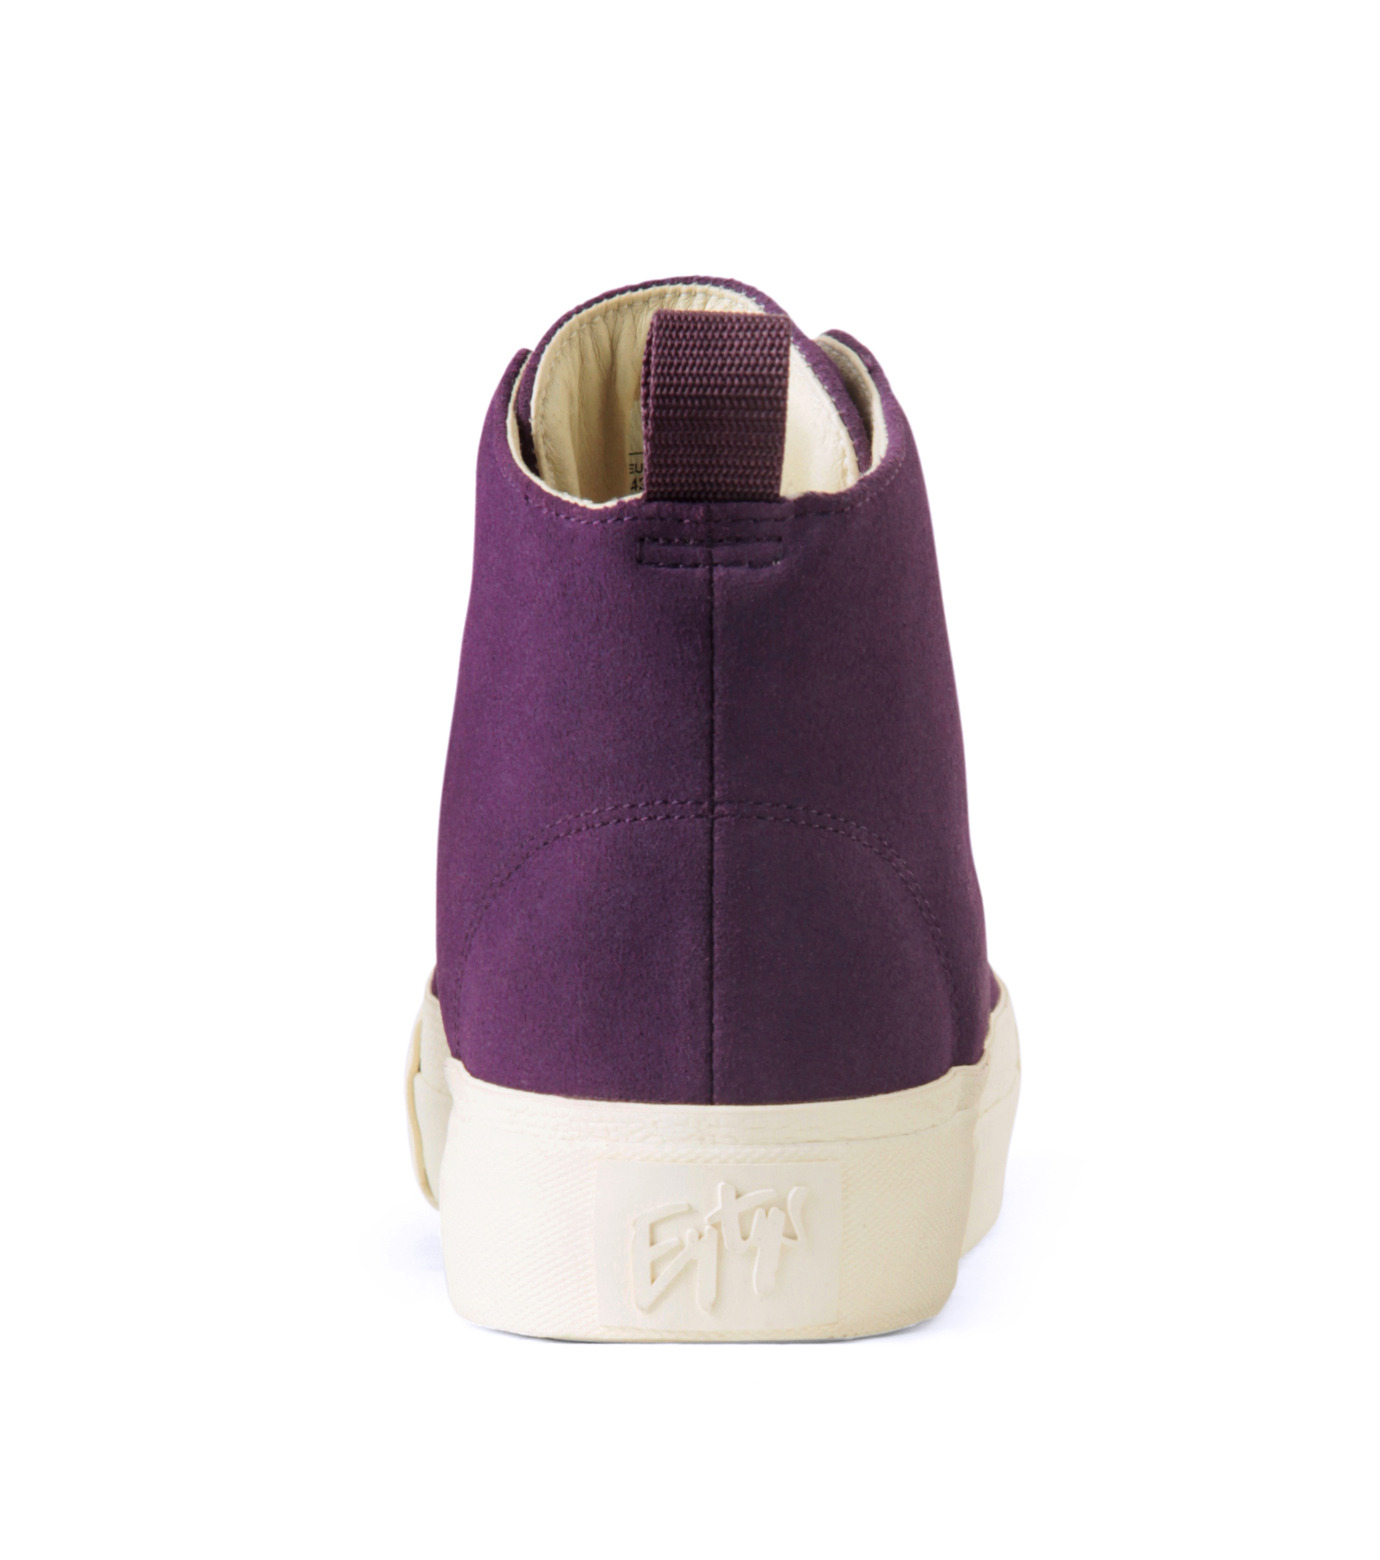 Eytys(エイティーズ)のSuedeHicutSneaker-PURPLE(スニーカー/sneaker)-ODYSSEY-SUE-82 拡大詳細画像3